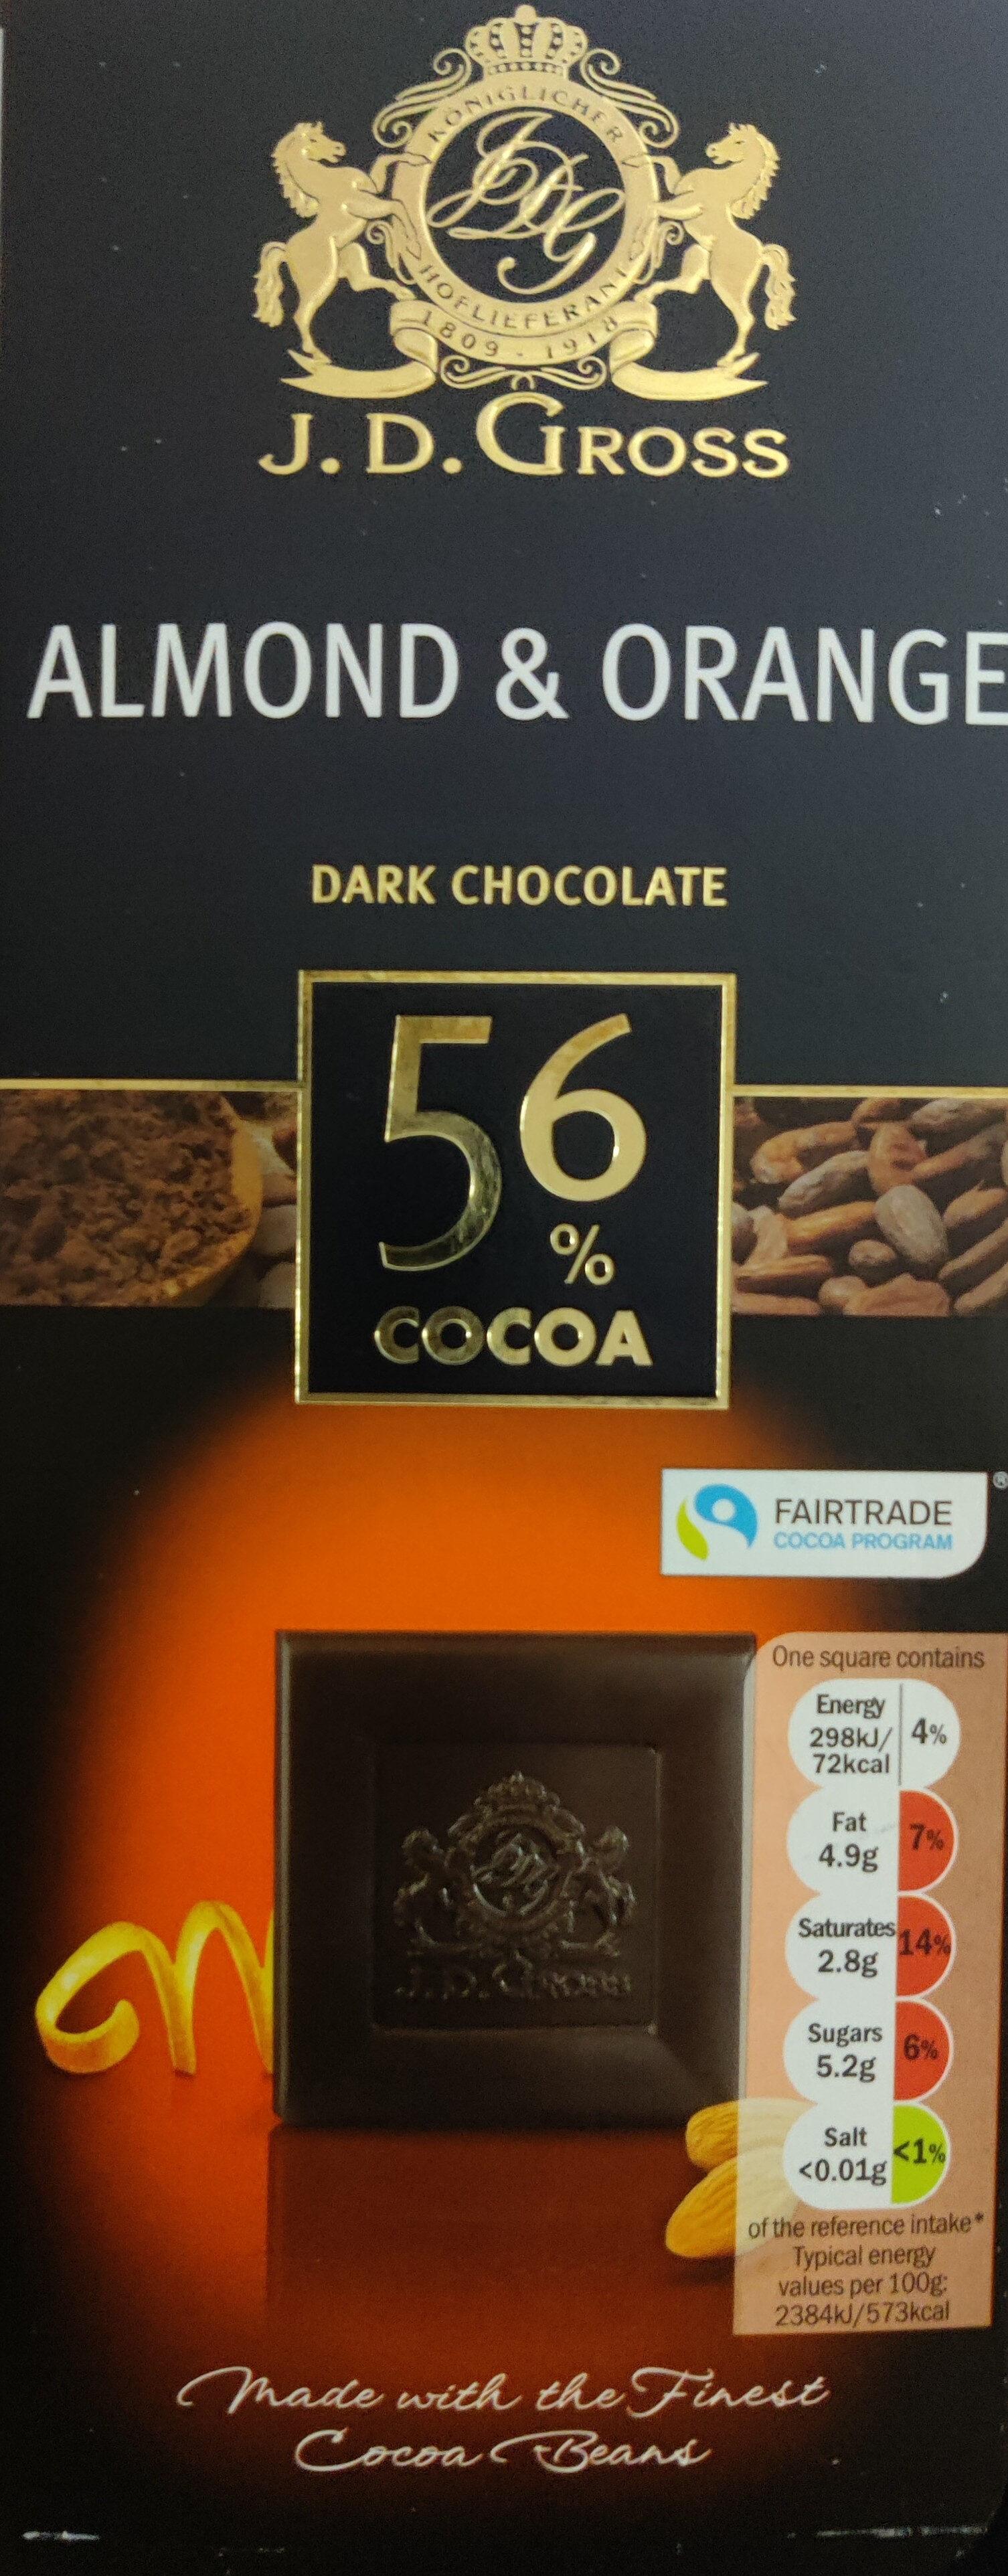 Almond & Orange Dark Chocolate - Product - en